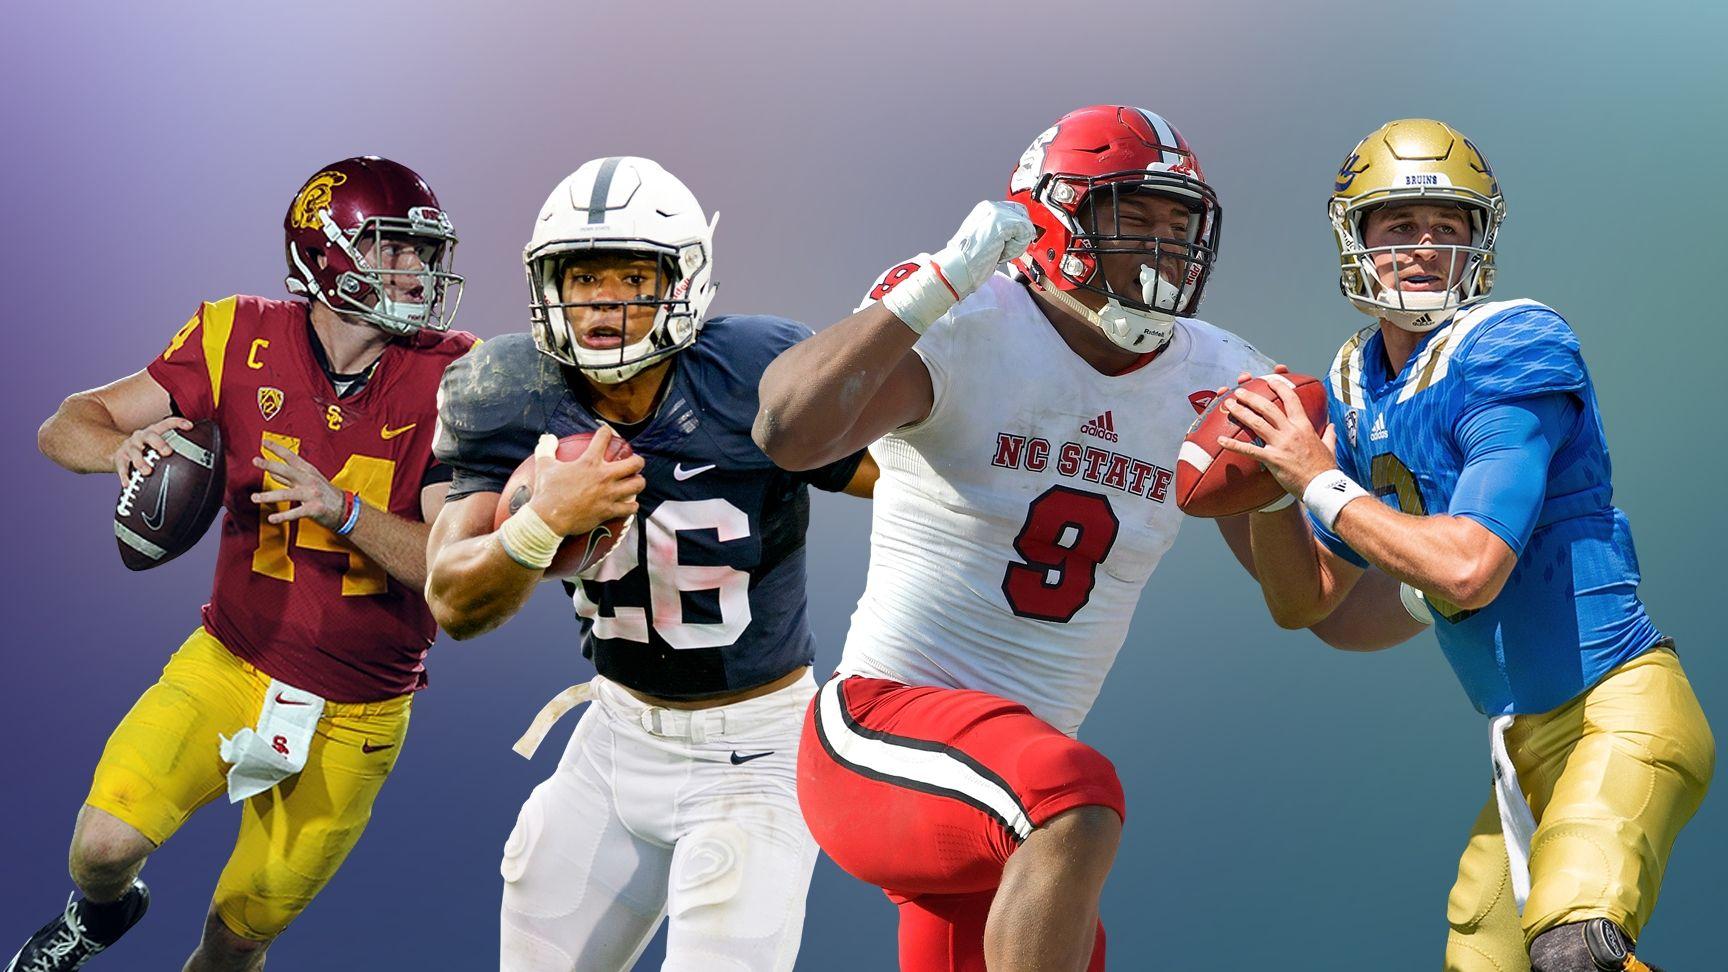 https://secure.espncdn.com/combiner/i?img=/media/motion/2017/1214/dm_171214_NFL_Browns_draft_choices/dm_171214_NFL_Browns_draft_choices.jpg